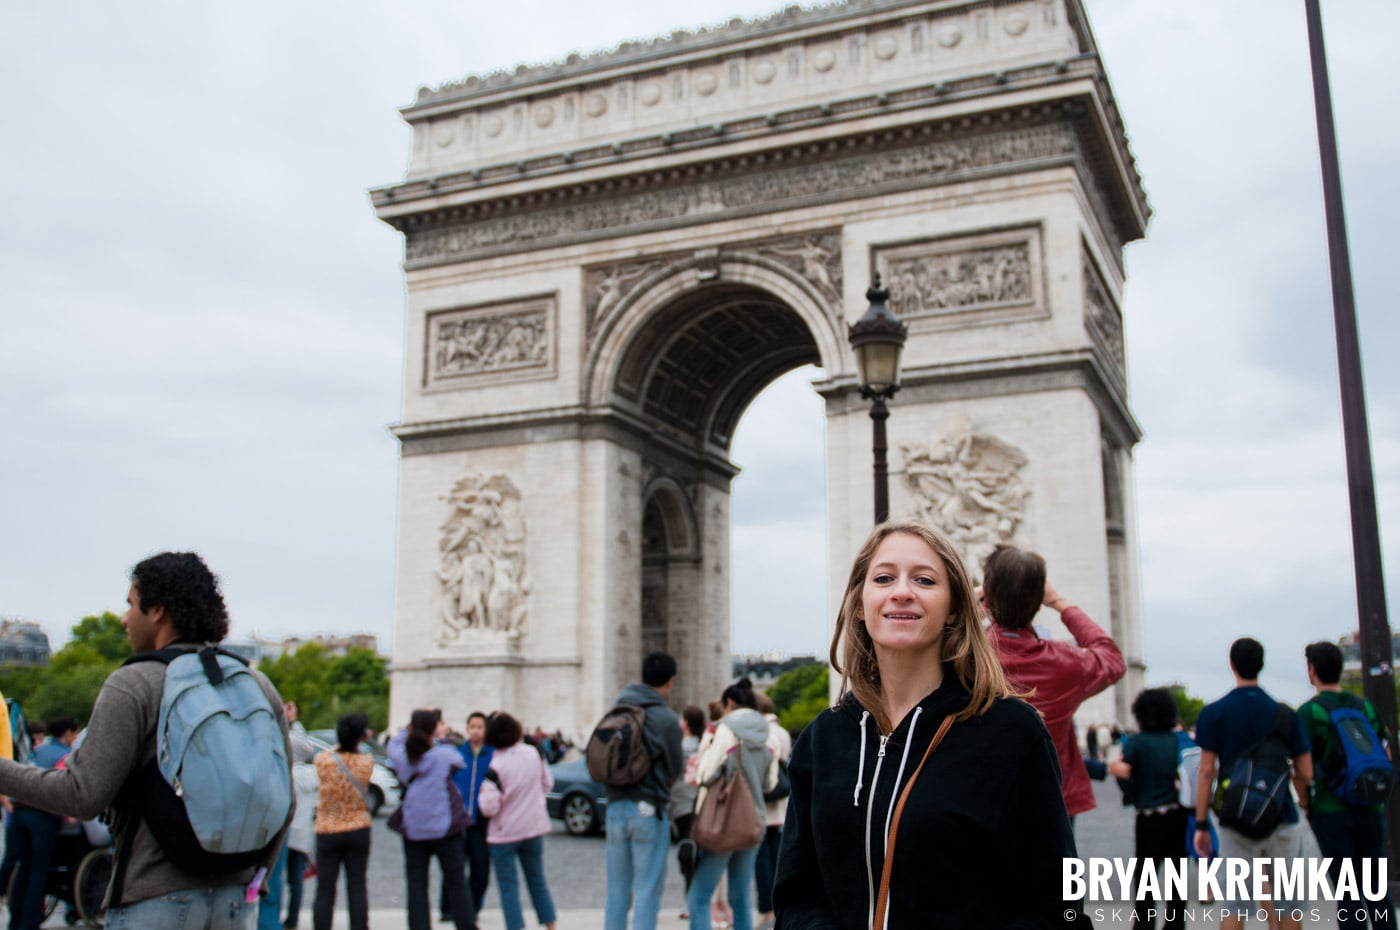 Paris, France Honeymoon - Day 3 - 7.20.11 (41)